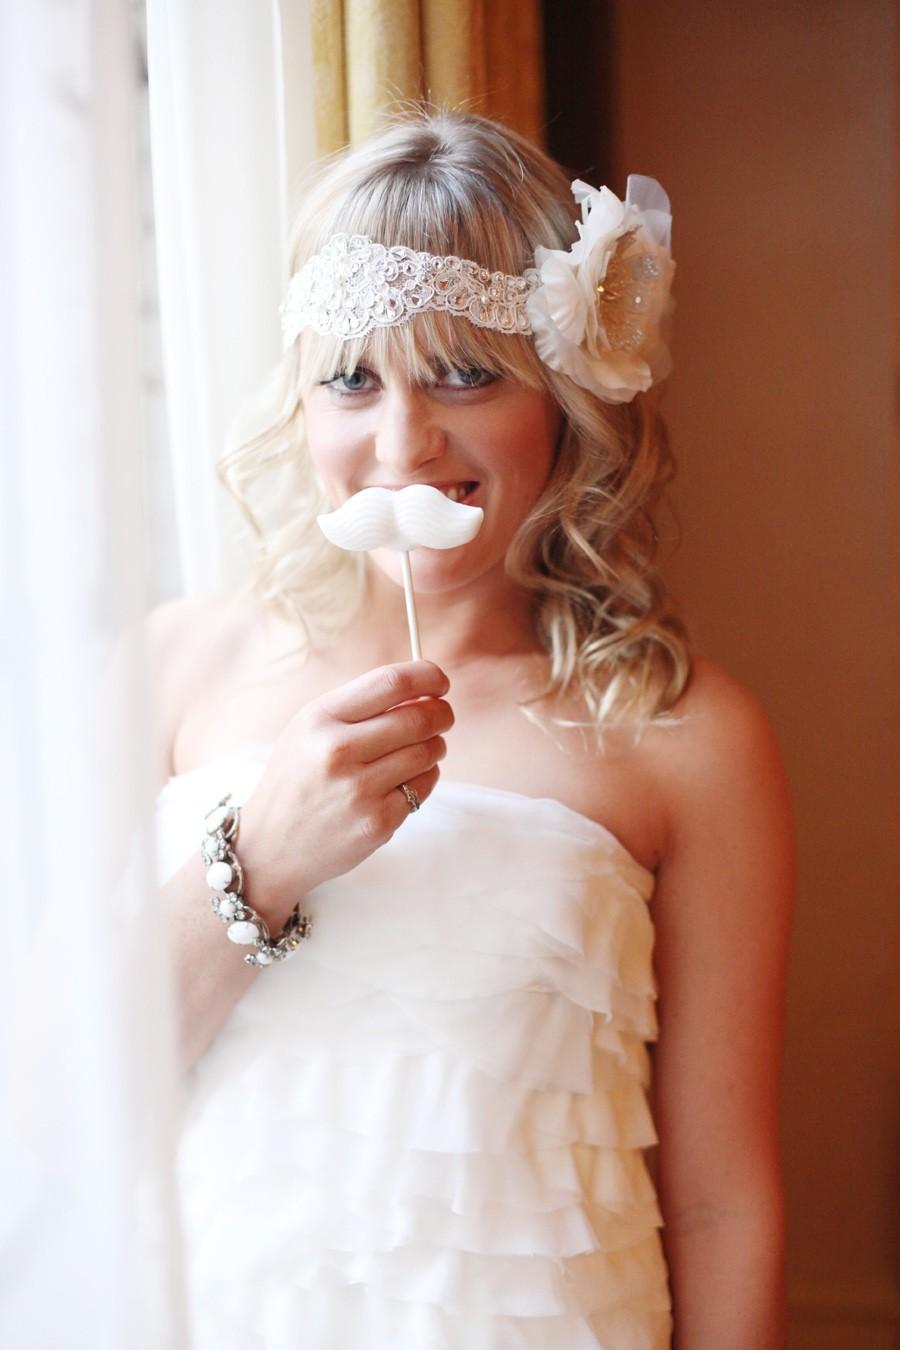 Sugary-sweet-wedding-decor-edible-handmade-weddings-mustache.full